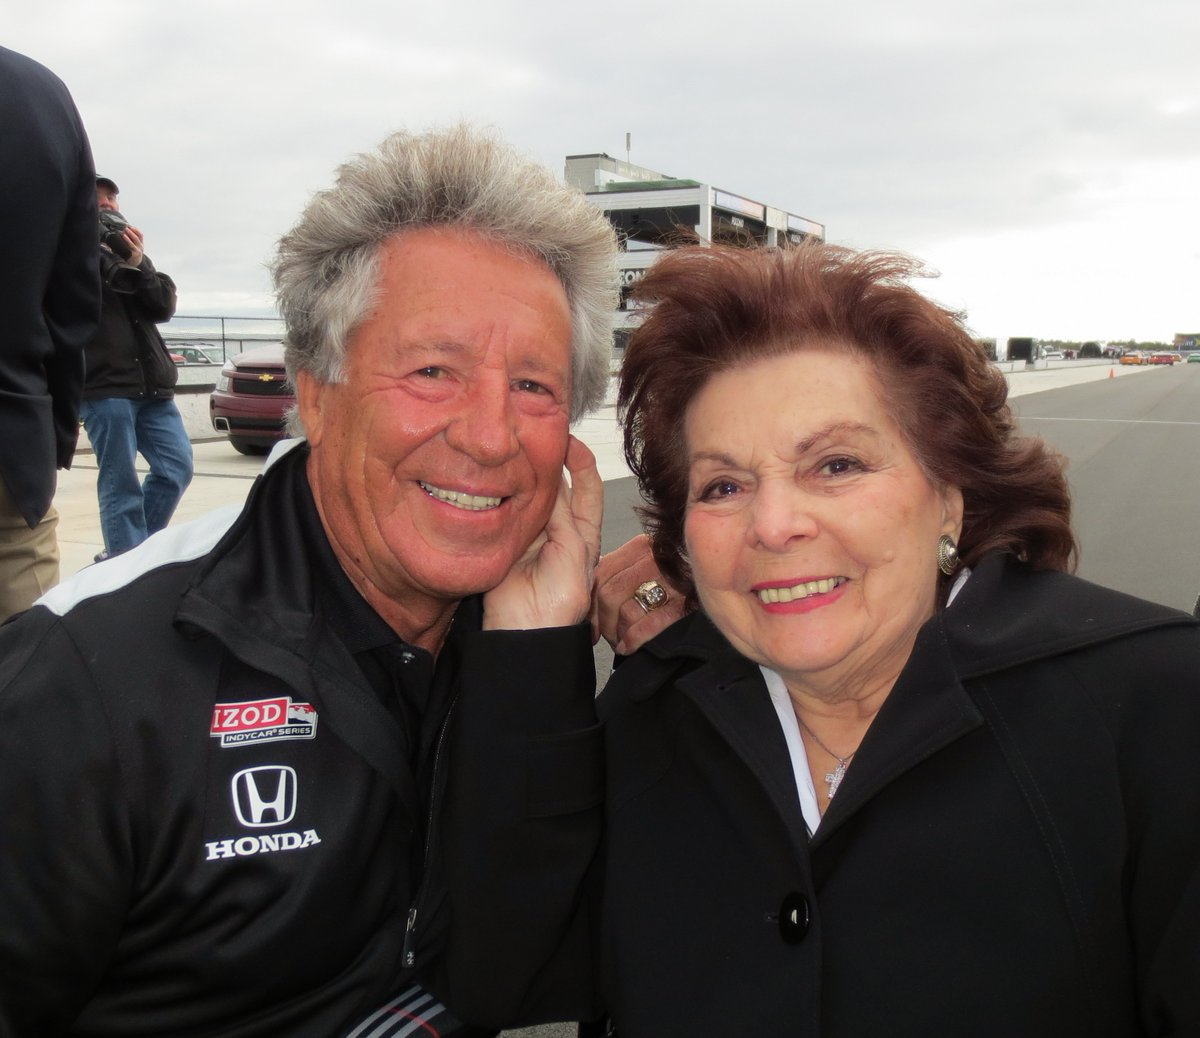 I'll miss her too.  A wonderful lady. https://t.co/Jpqtfa306U https://t.co/dNexP9UPc8